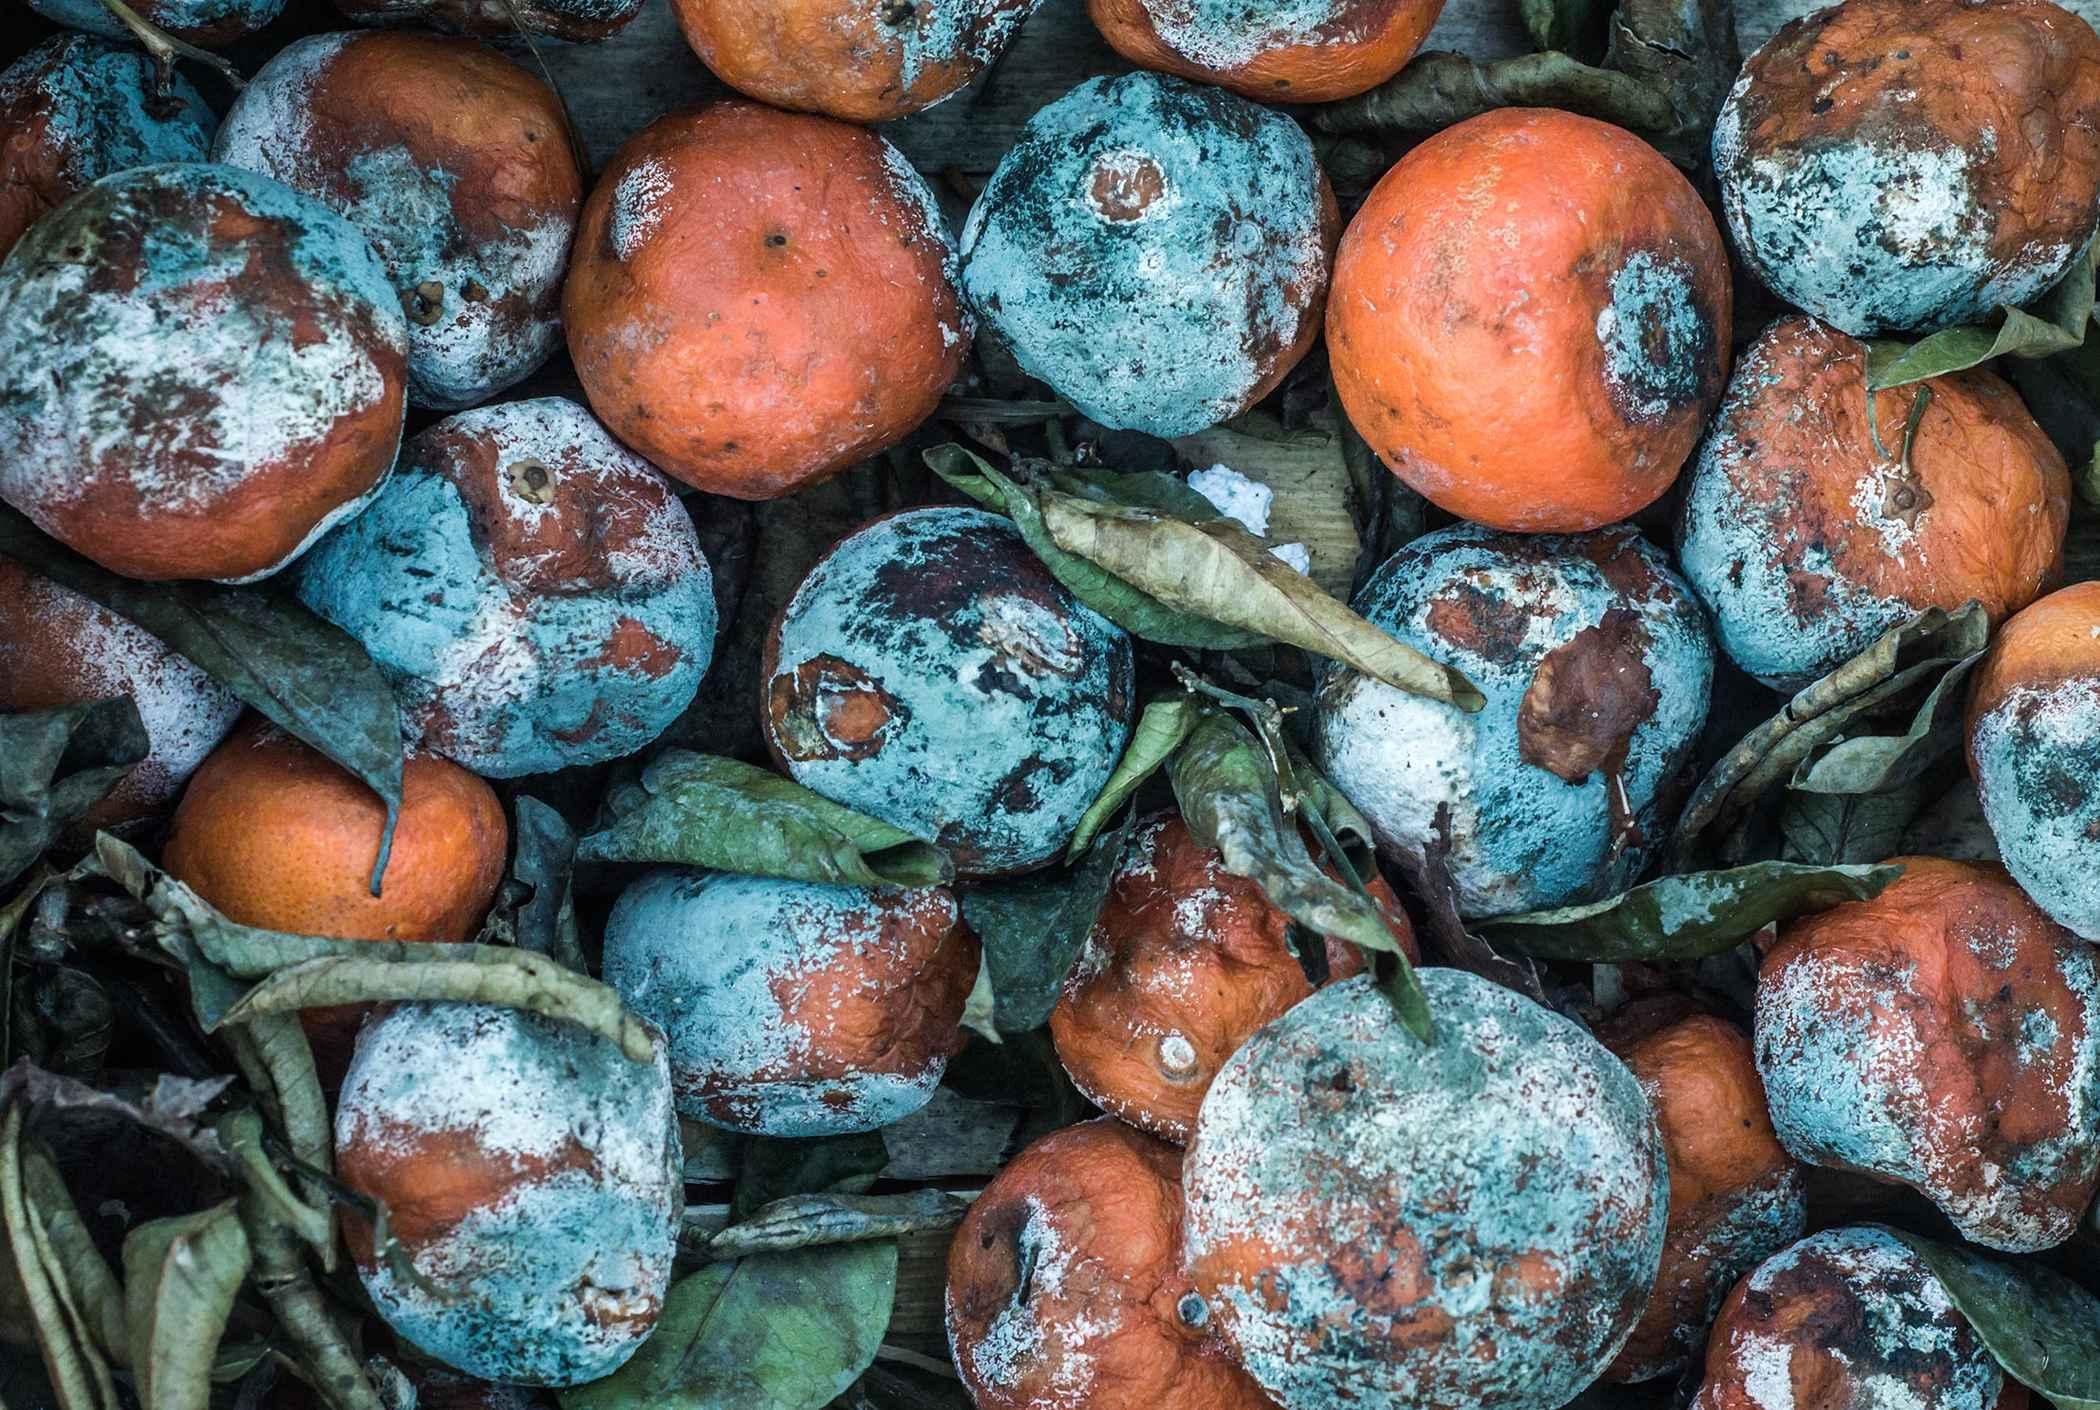 rotting-fruit-texture-background-PJK7TZ9